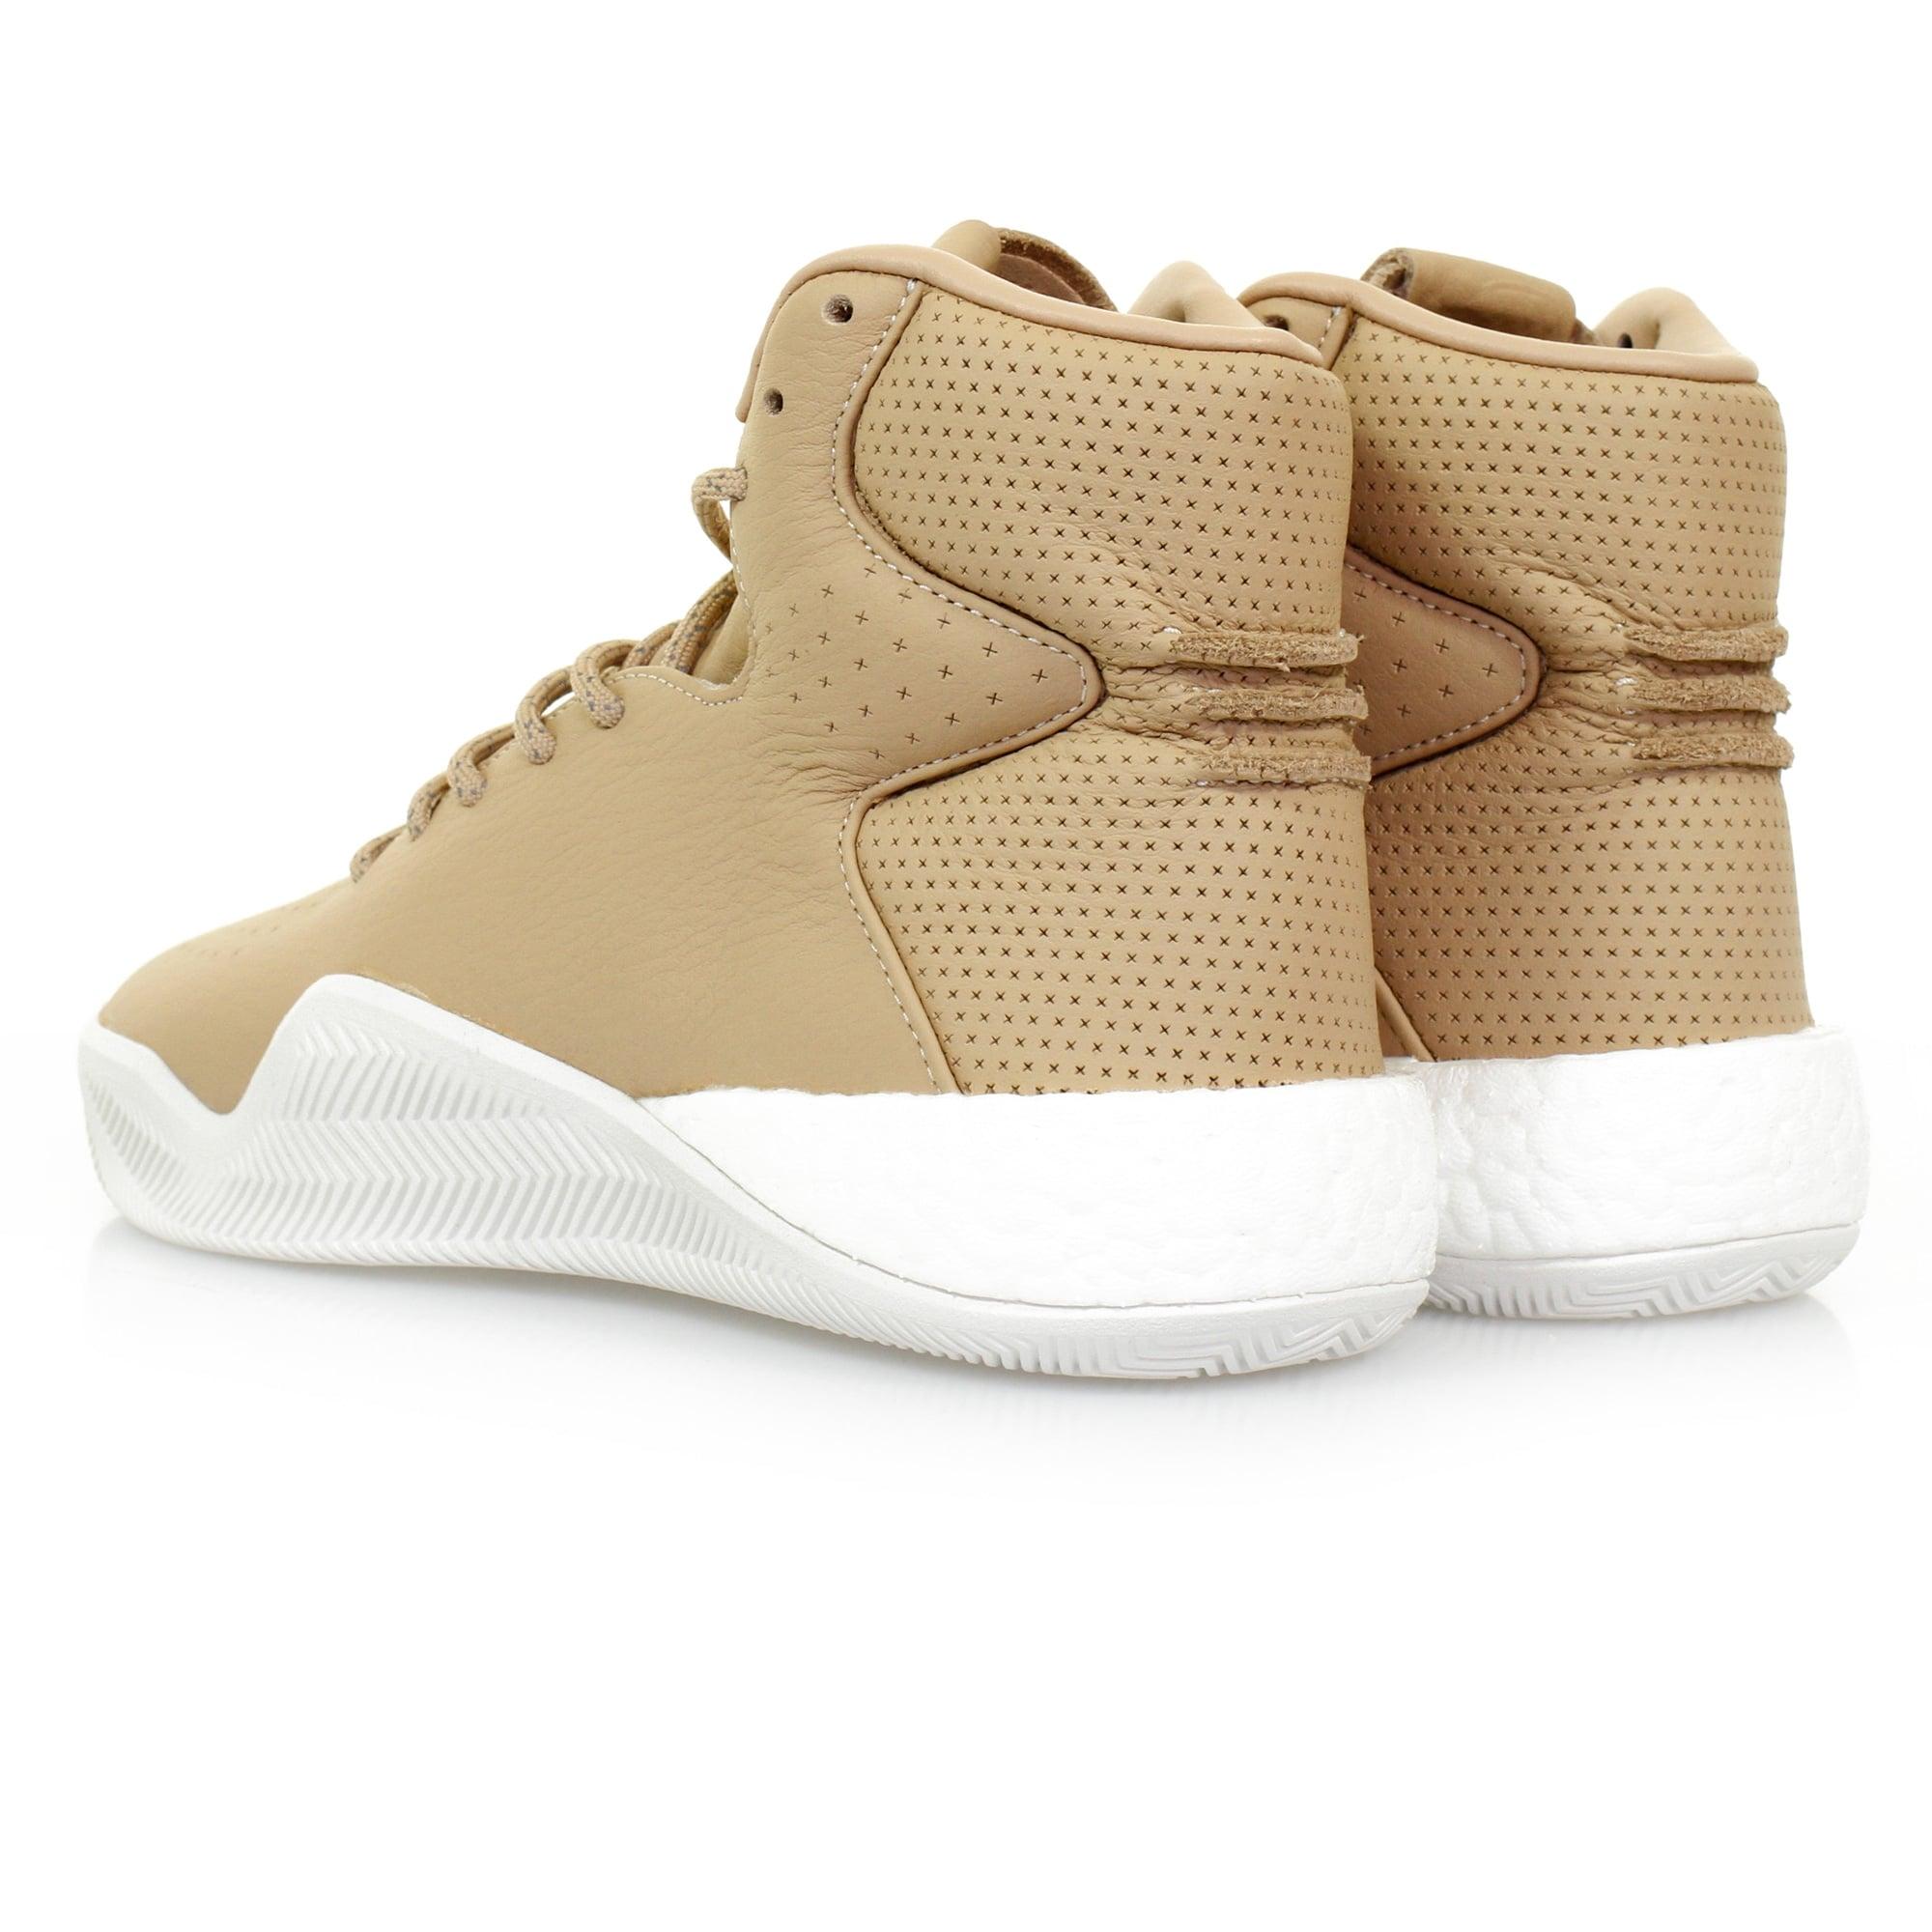 99797f721407 Adidas Tubular Instinct Boost Chalk White Beige Shoe BB8400